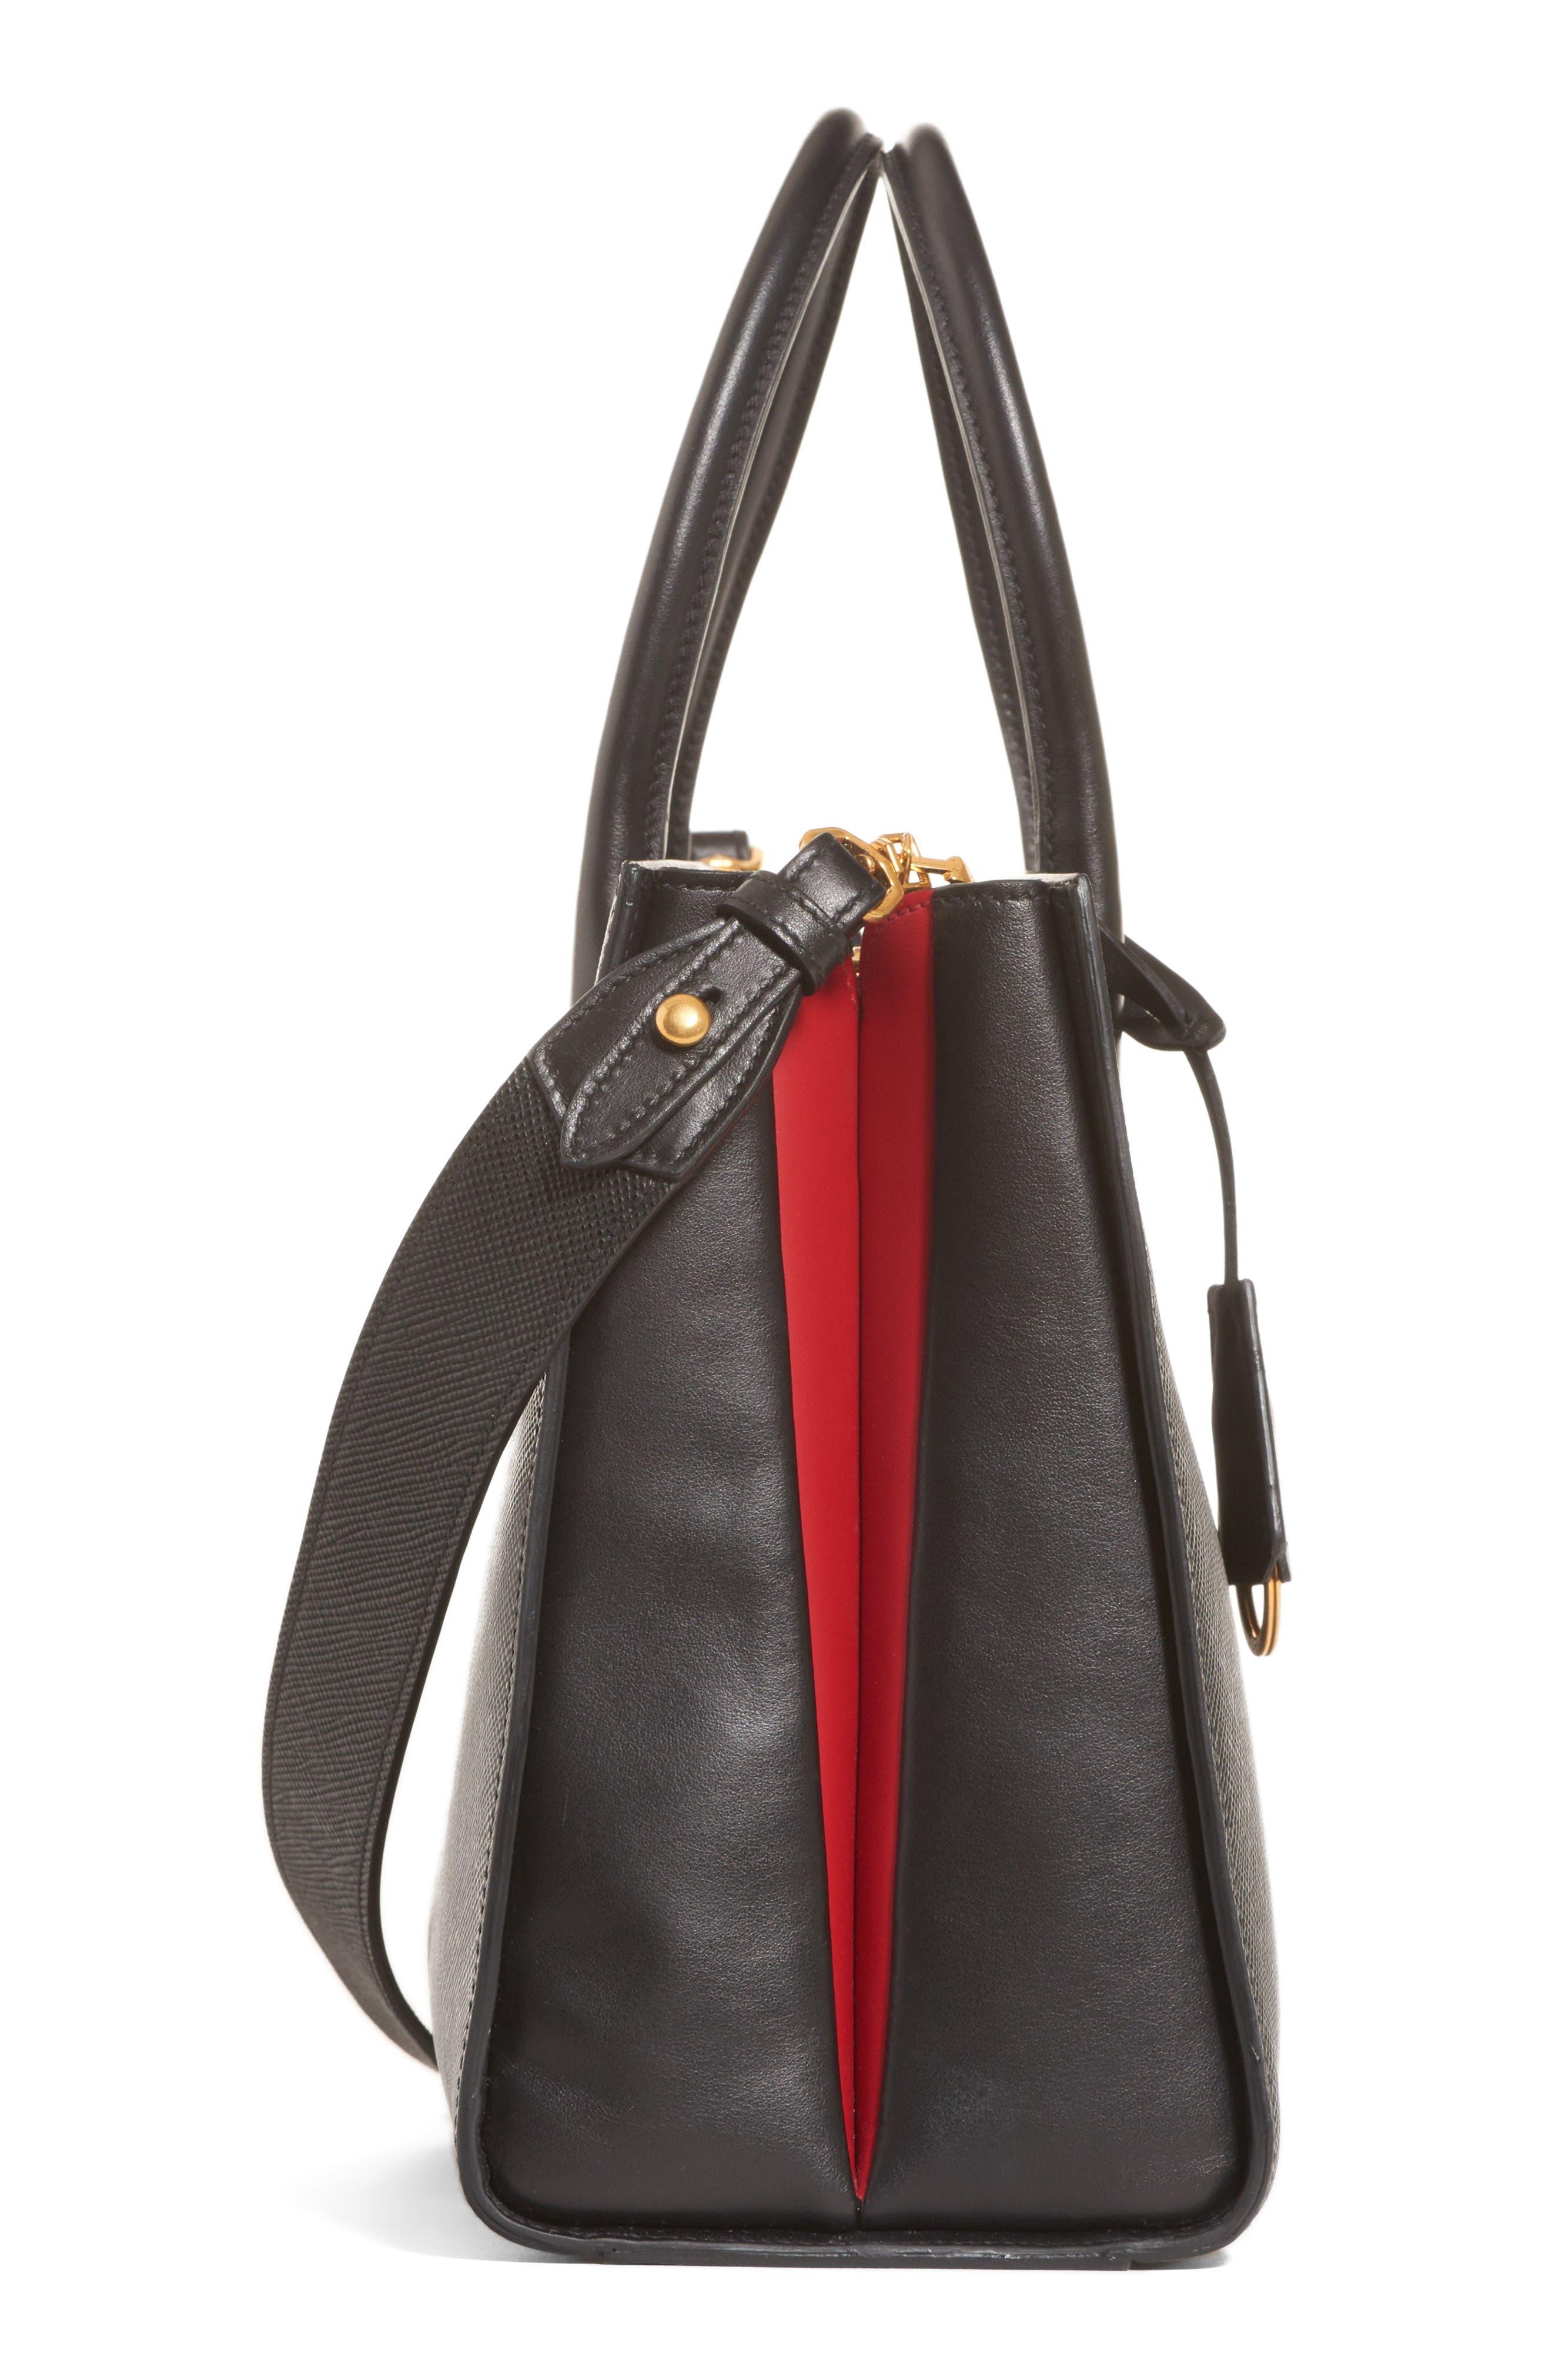 Medium Saffiano Leather Tote,                             Alternate thumbnail 4, color,                             001